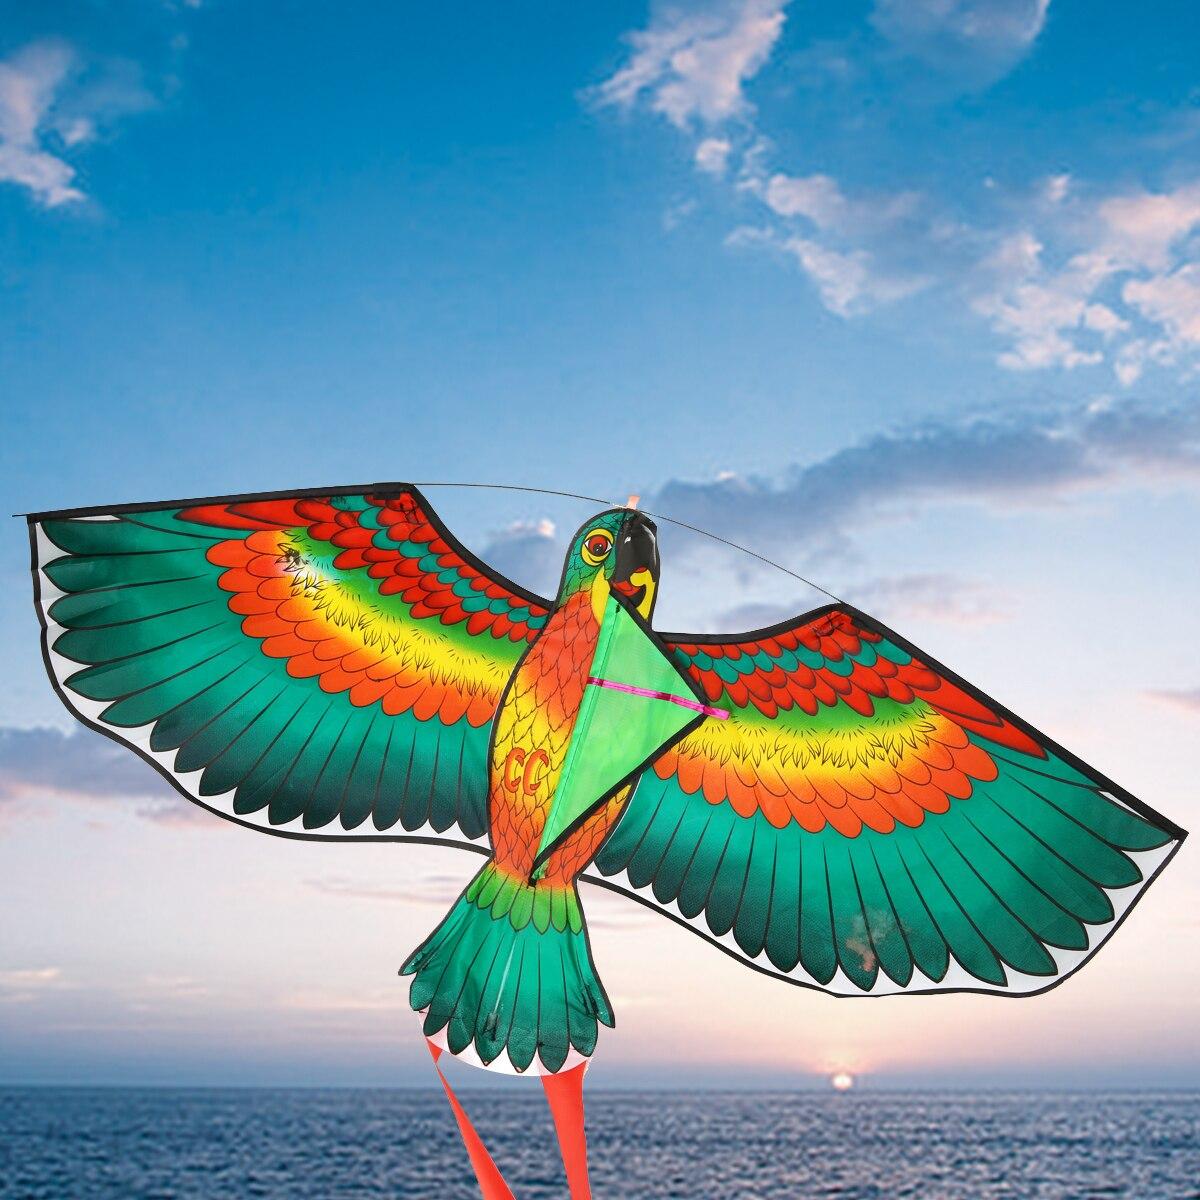 Hard-Working Ripstop Pipas Esportivas Bar Kites For Adults Cometa Cometas Para Adultos Kite Flying Windsock Pipas Brinquedo Ar Livre Atacado Outdoor Fun & Sports